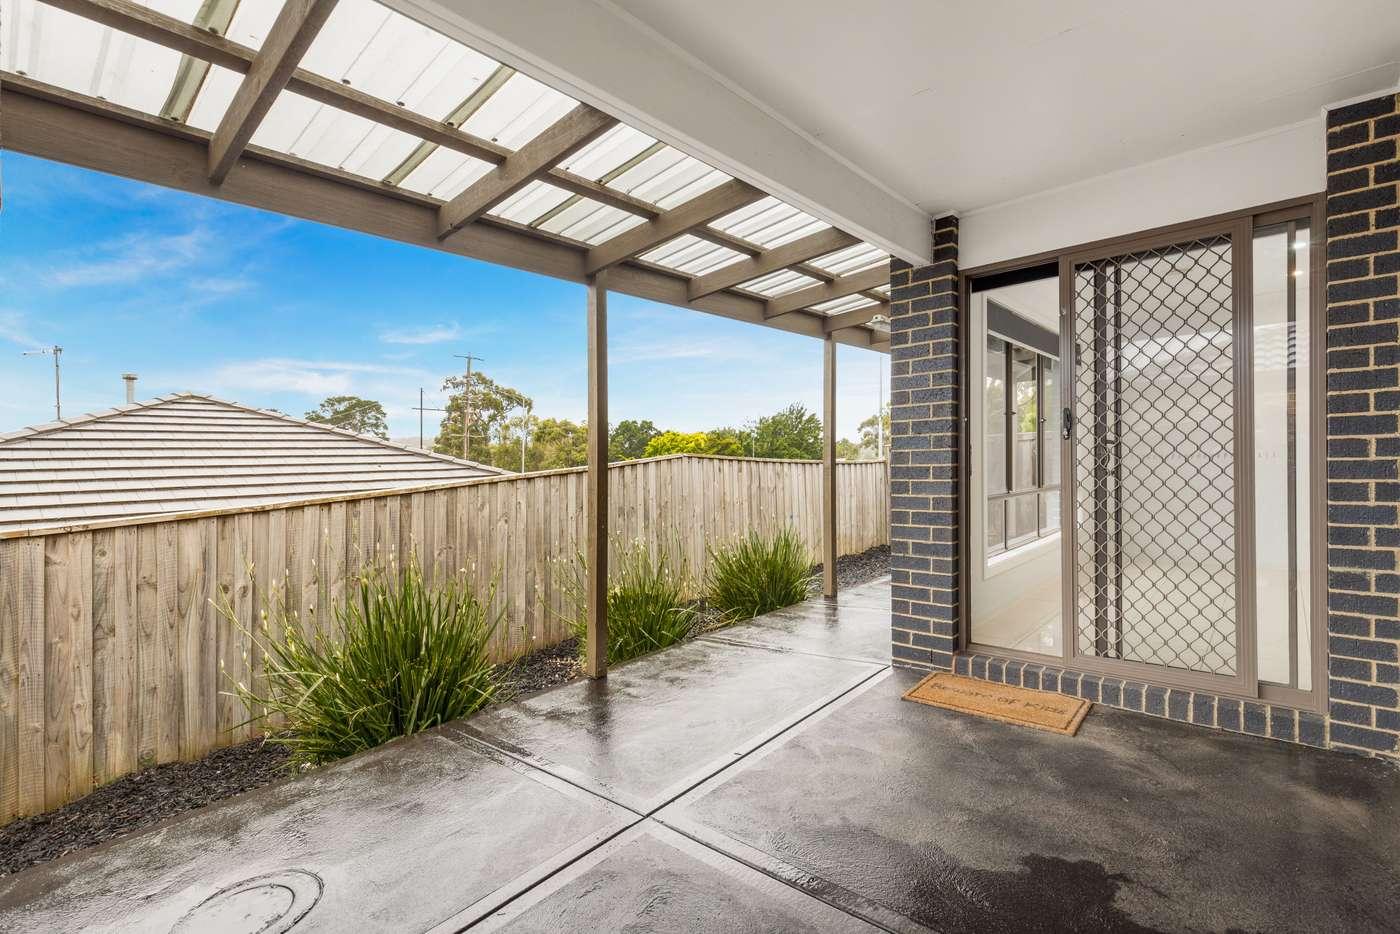 Sixth view of Homely house listing, 47 Rockford Street, Pakenham VIC 3810